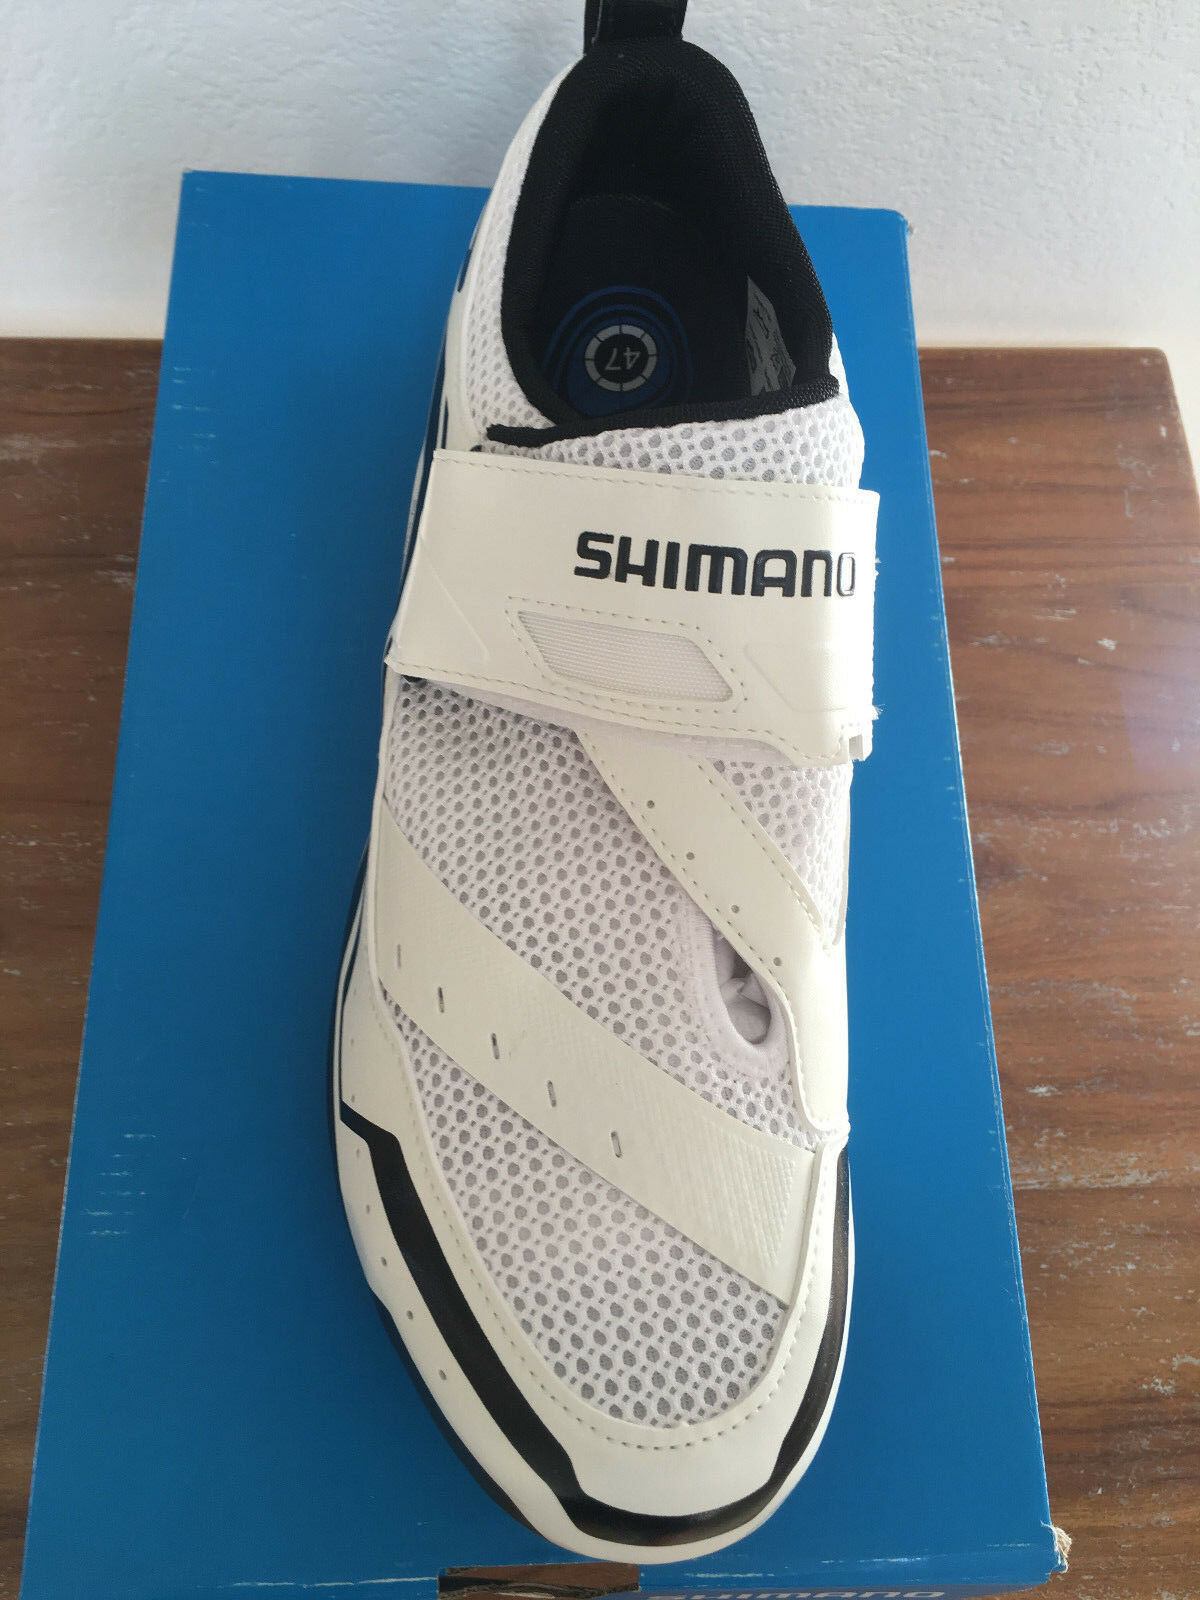 Shimano mens SH-TR 32 CYCLING SHOES- TRIATHLON WITH NYLON SOLE